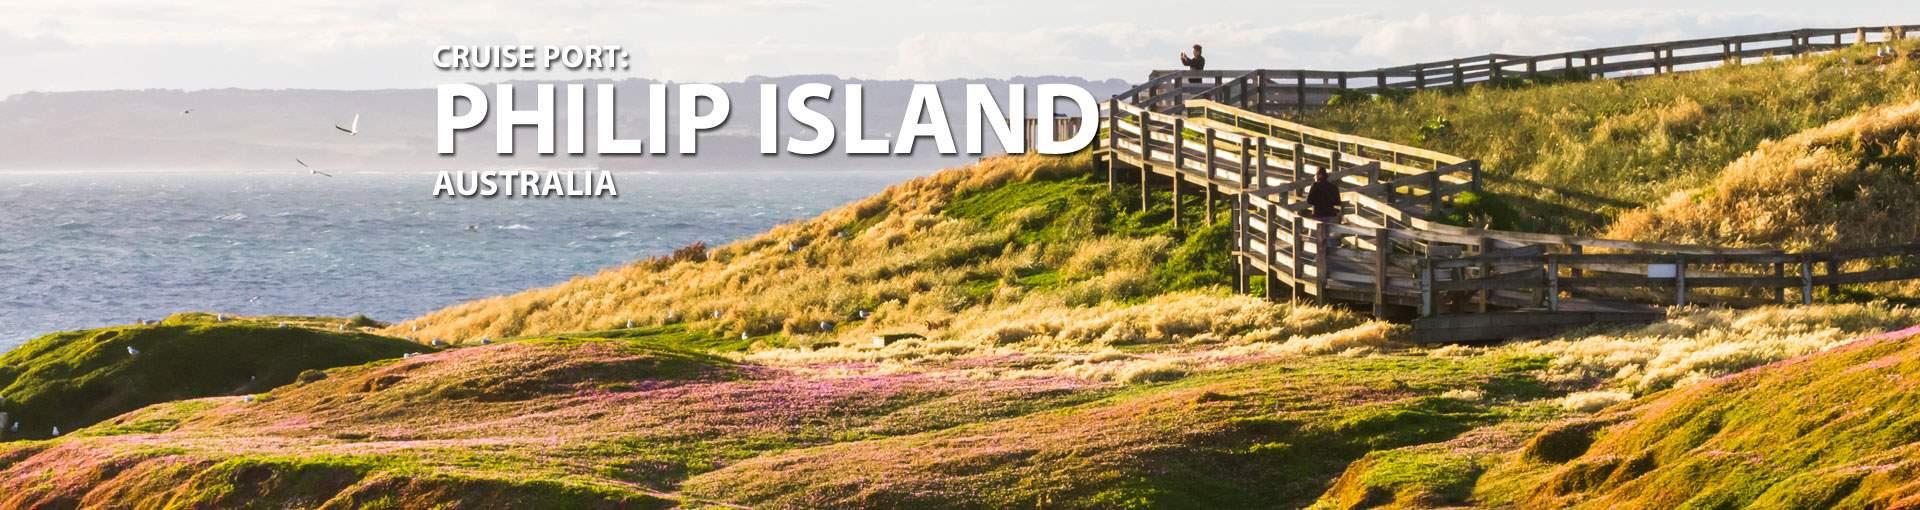 Cruises to Philip Island,Australia